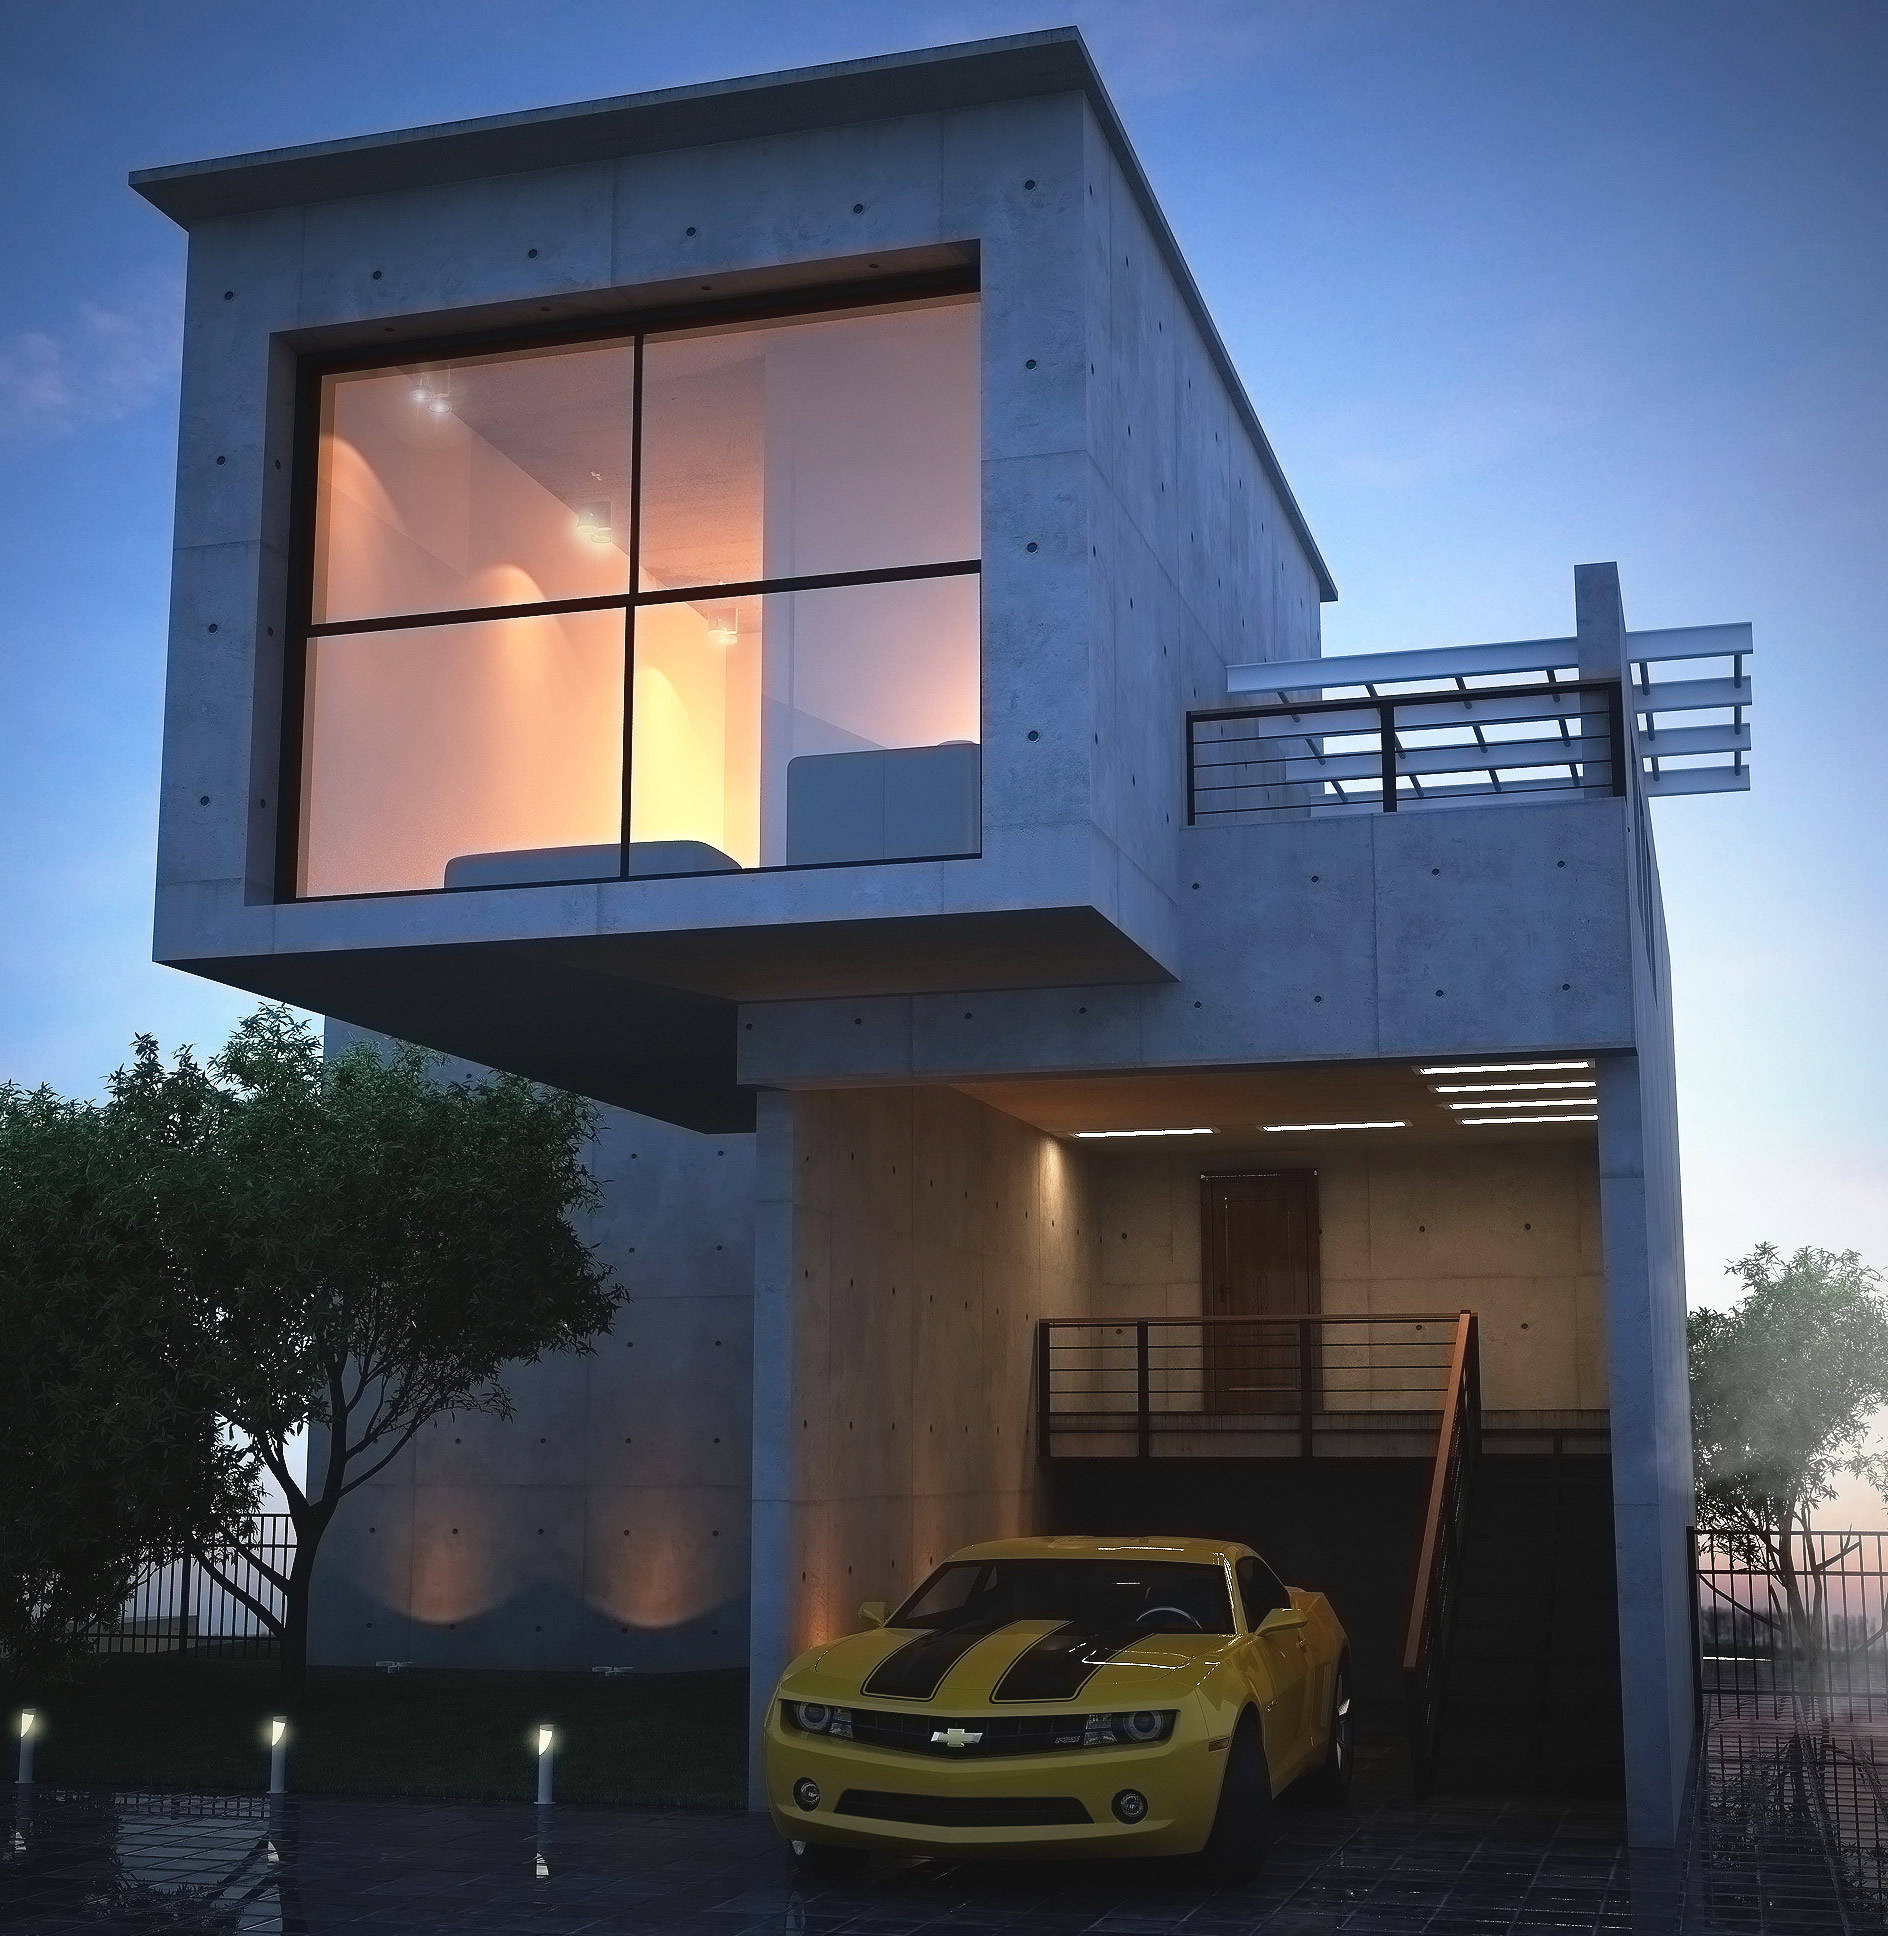 Casas lindas 26 fotos inspiradoras arquidicas for Modelos de casas procrear clasica